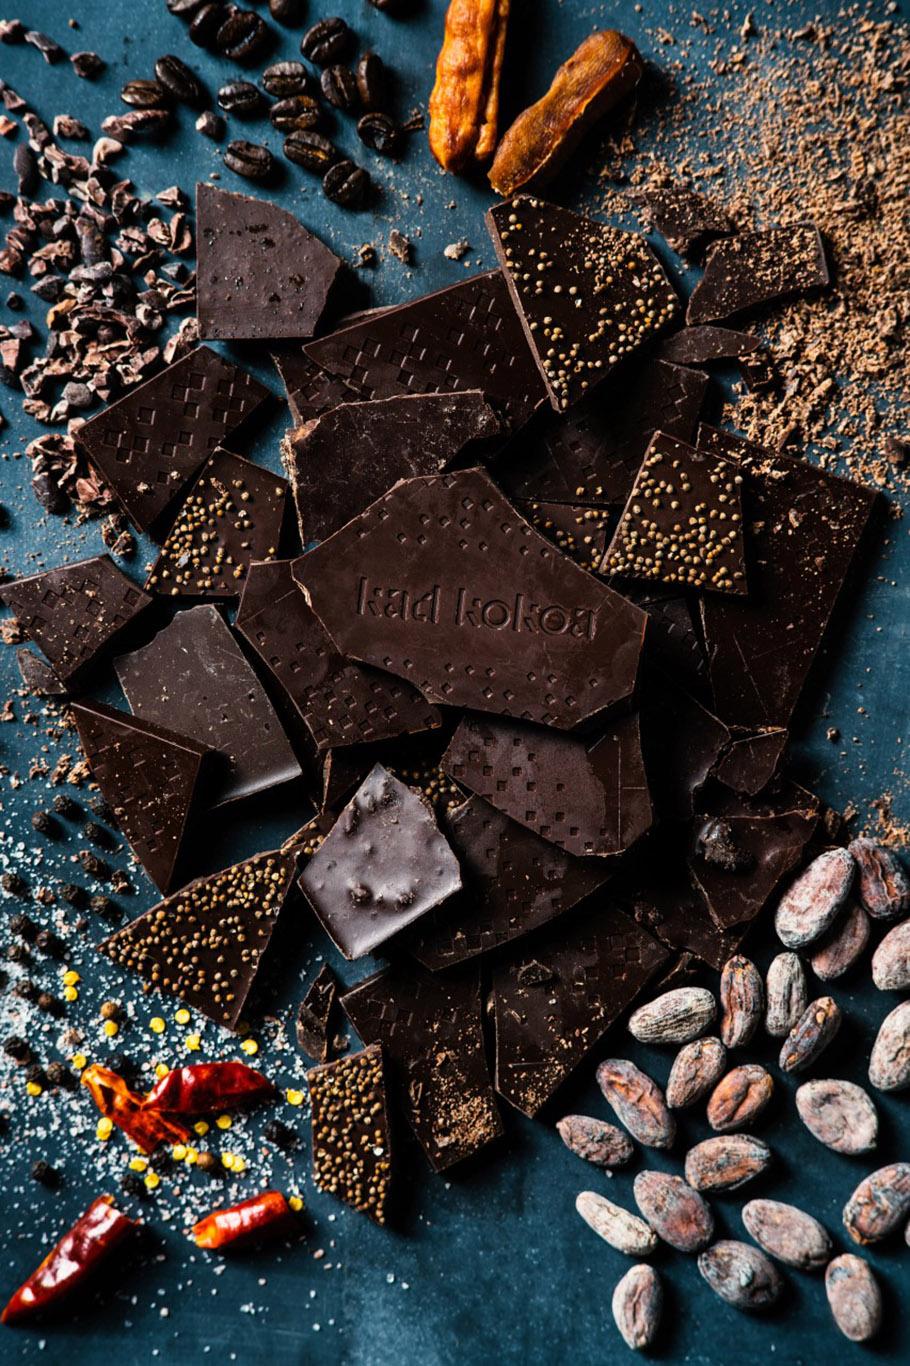 「Kad Kokoa」タイのチョコレートブランド